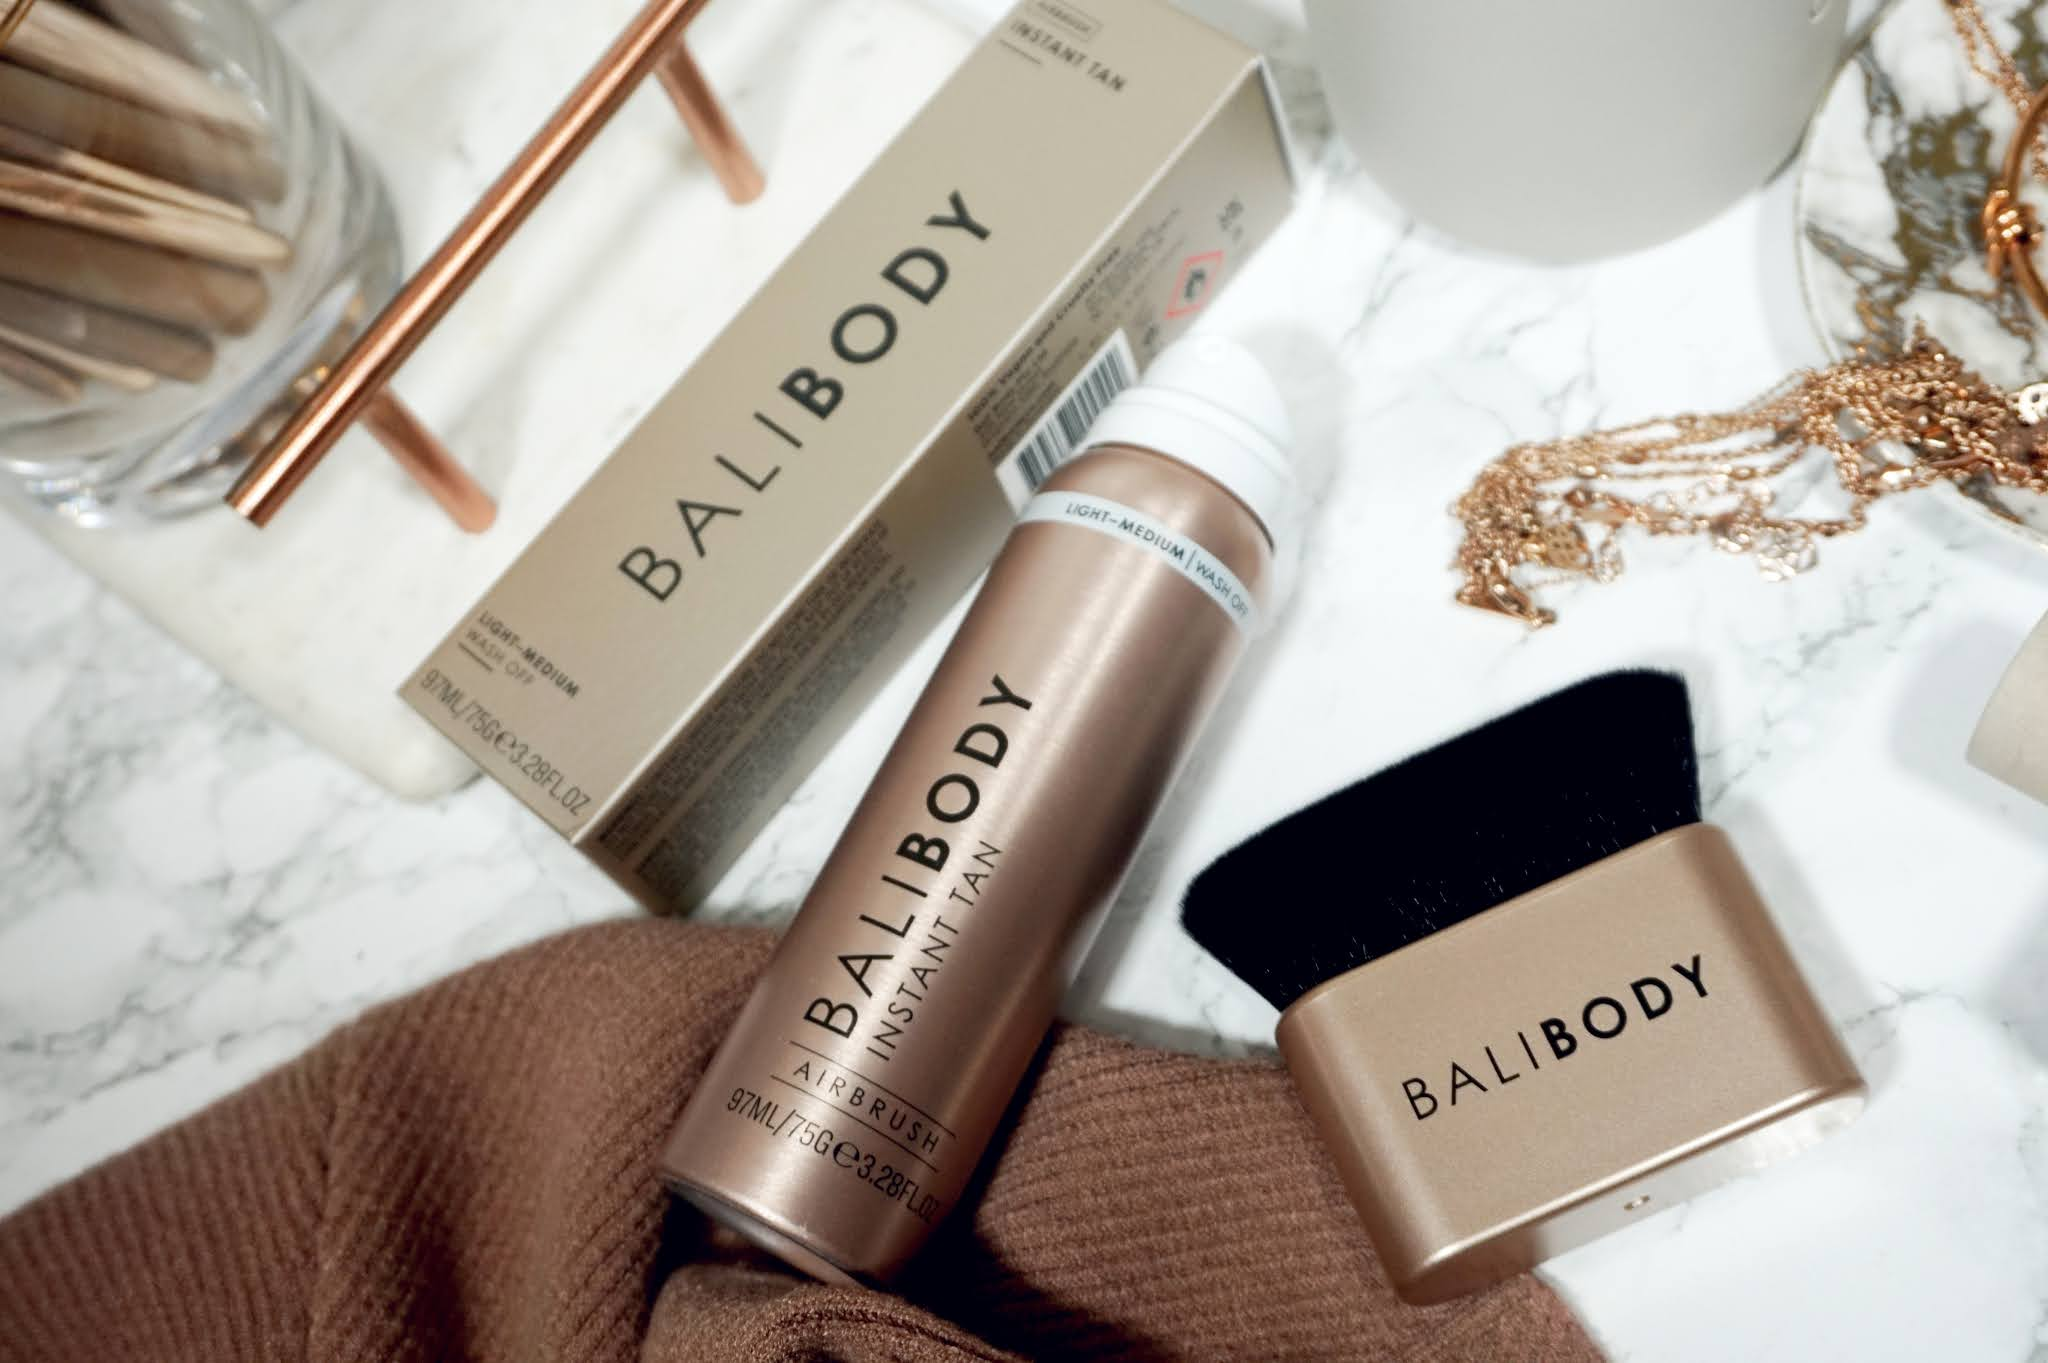 Bali Body Instant Tan Review